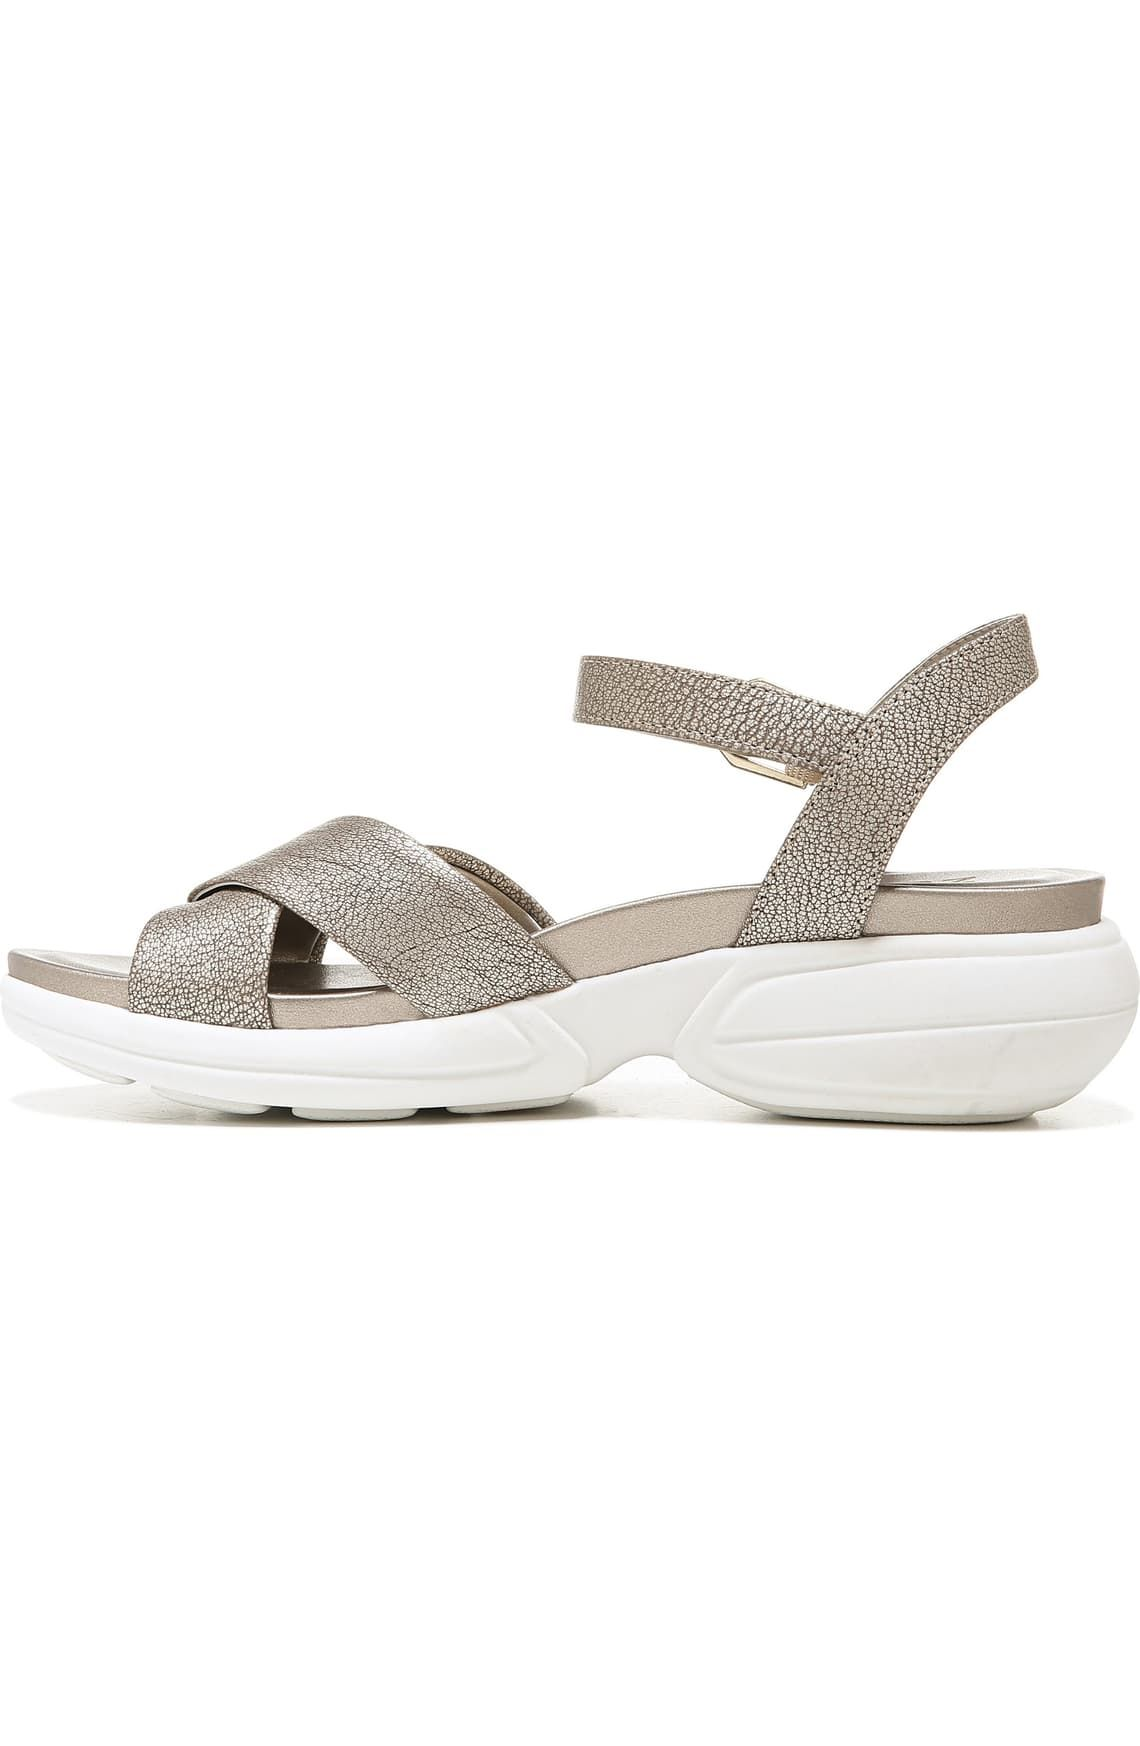 Pin on Women sandals